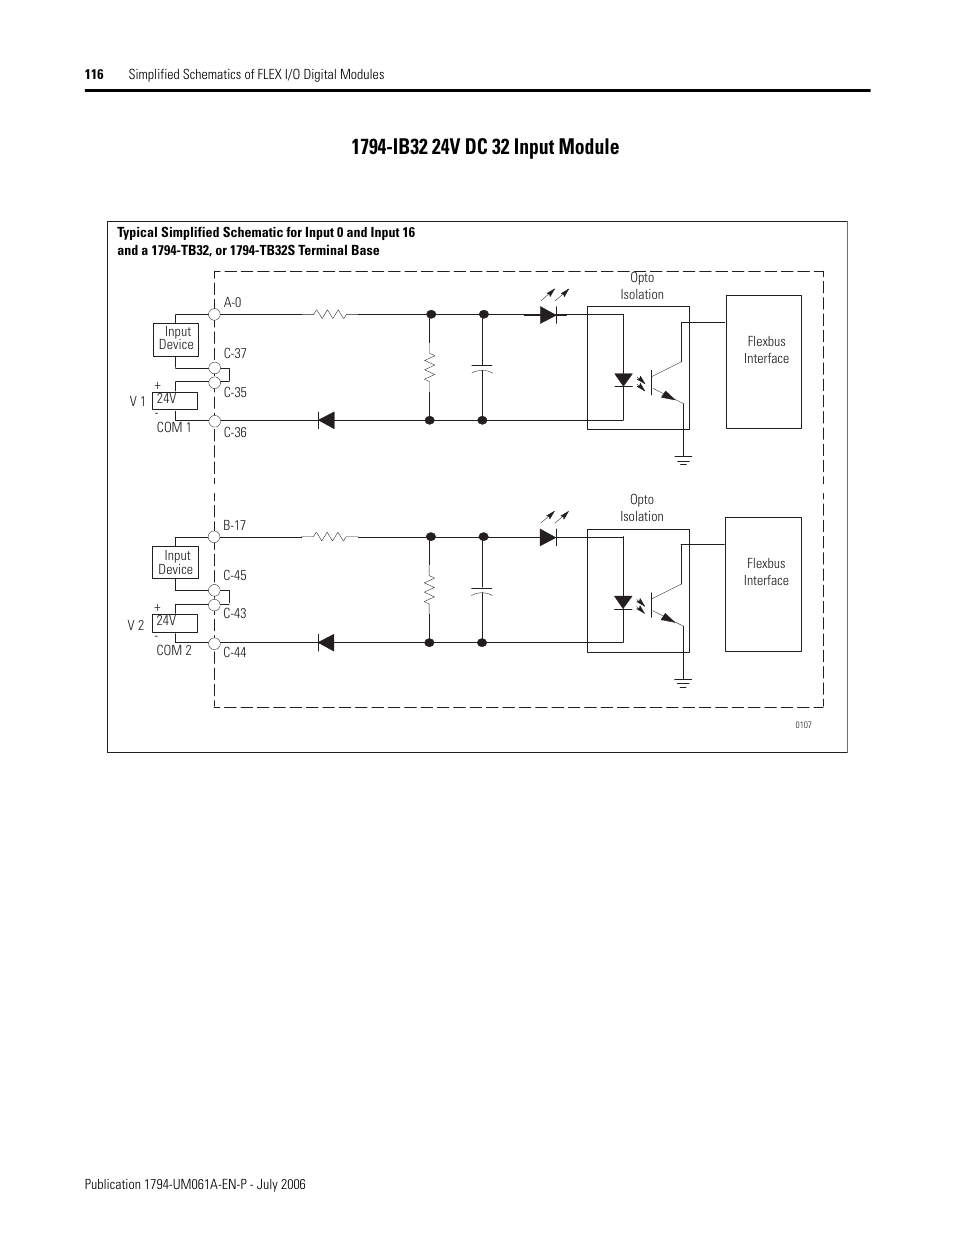 rockwell automation 1794 ob16d flex i_o diagnostic modules user manual page118 1794 ib32 24v dc 32 input module rockwell automation 1794 ob16d 1794 ib32 wiring diagram at mifinder.co